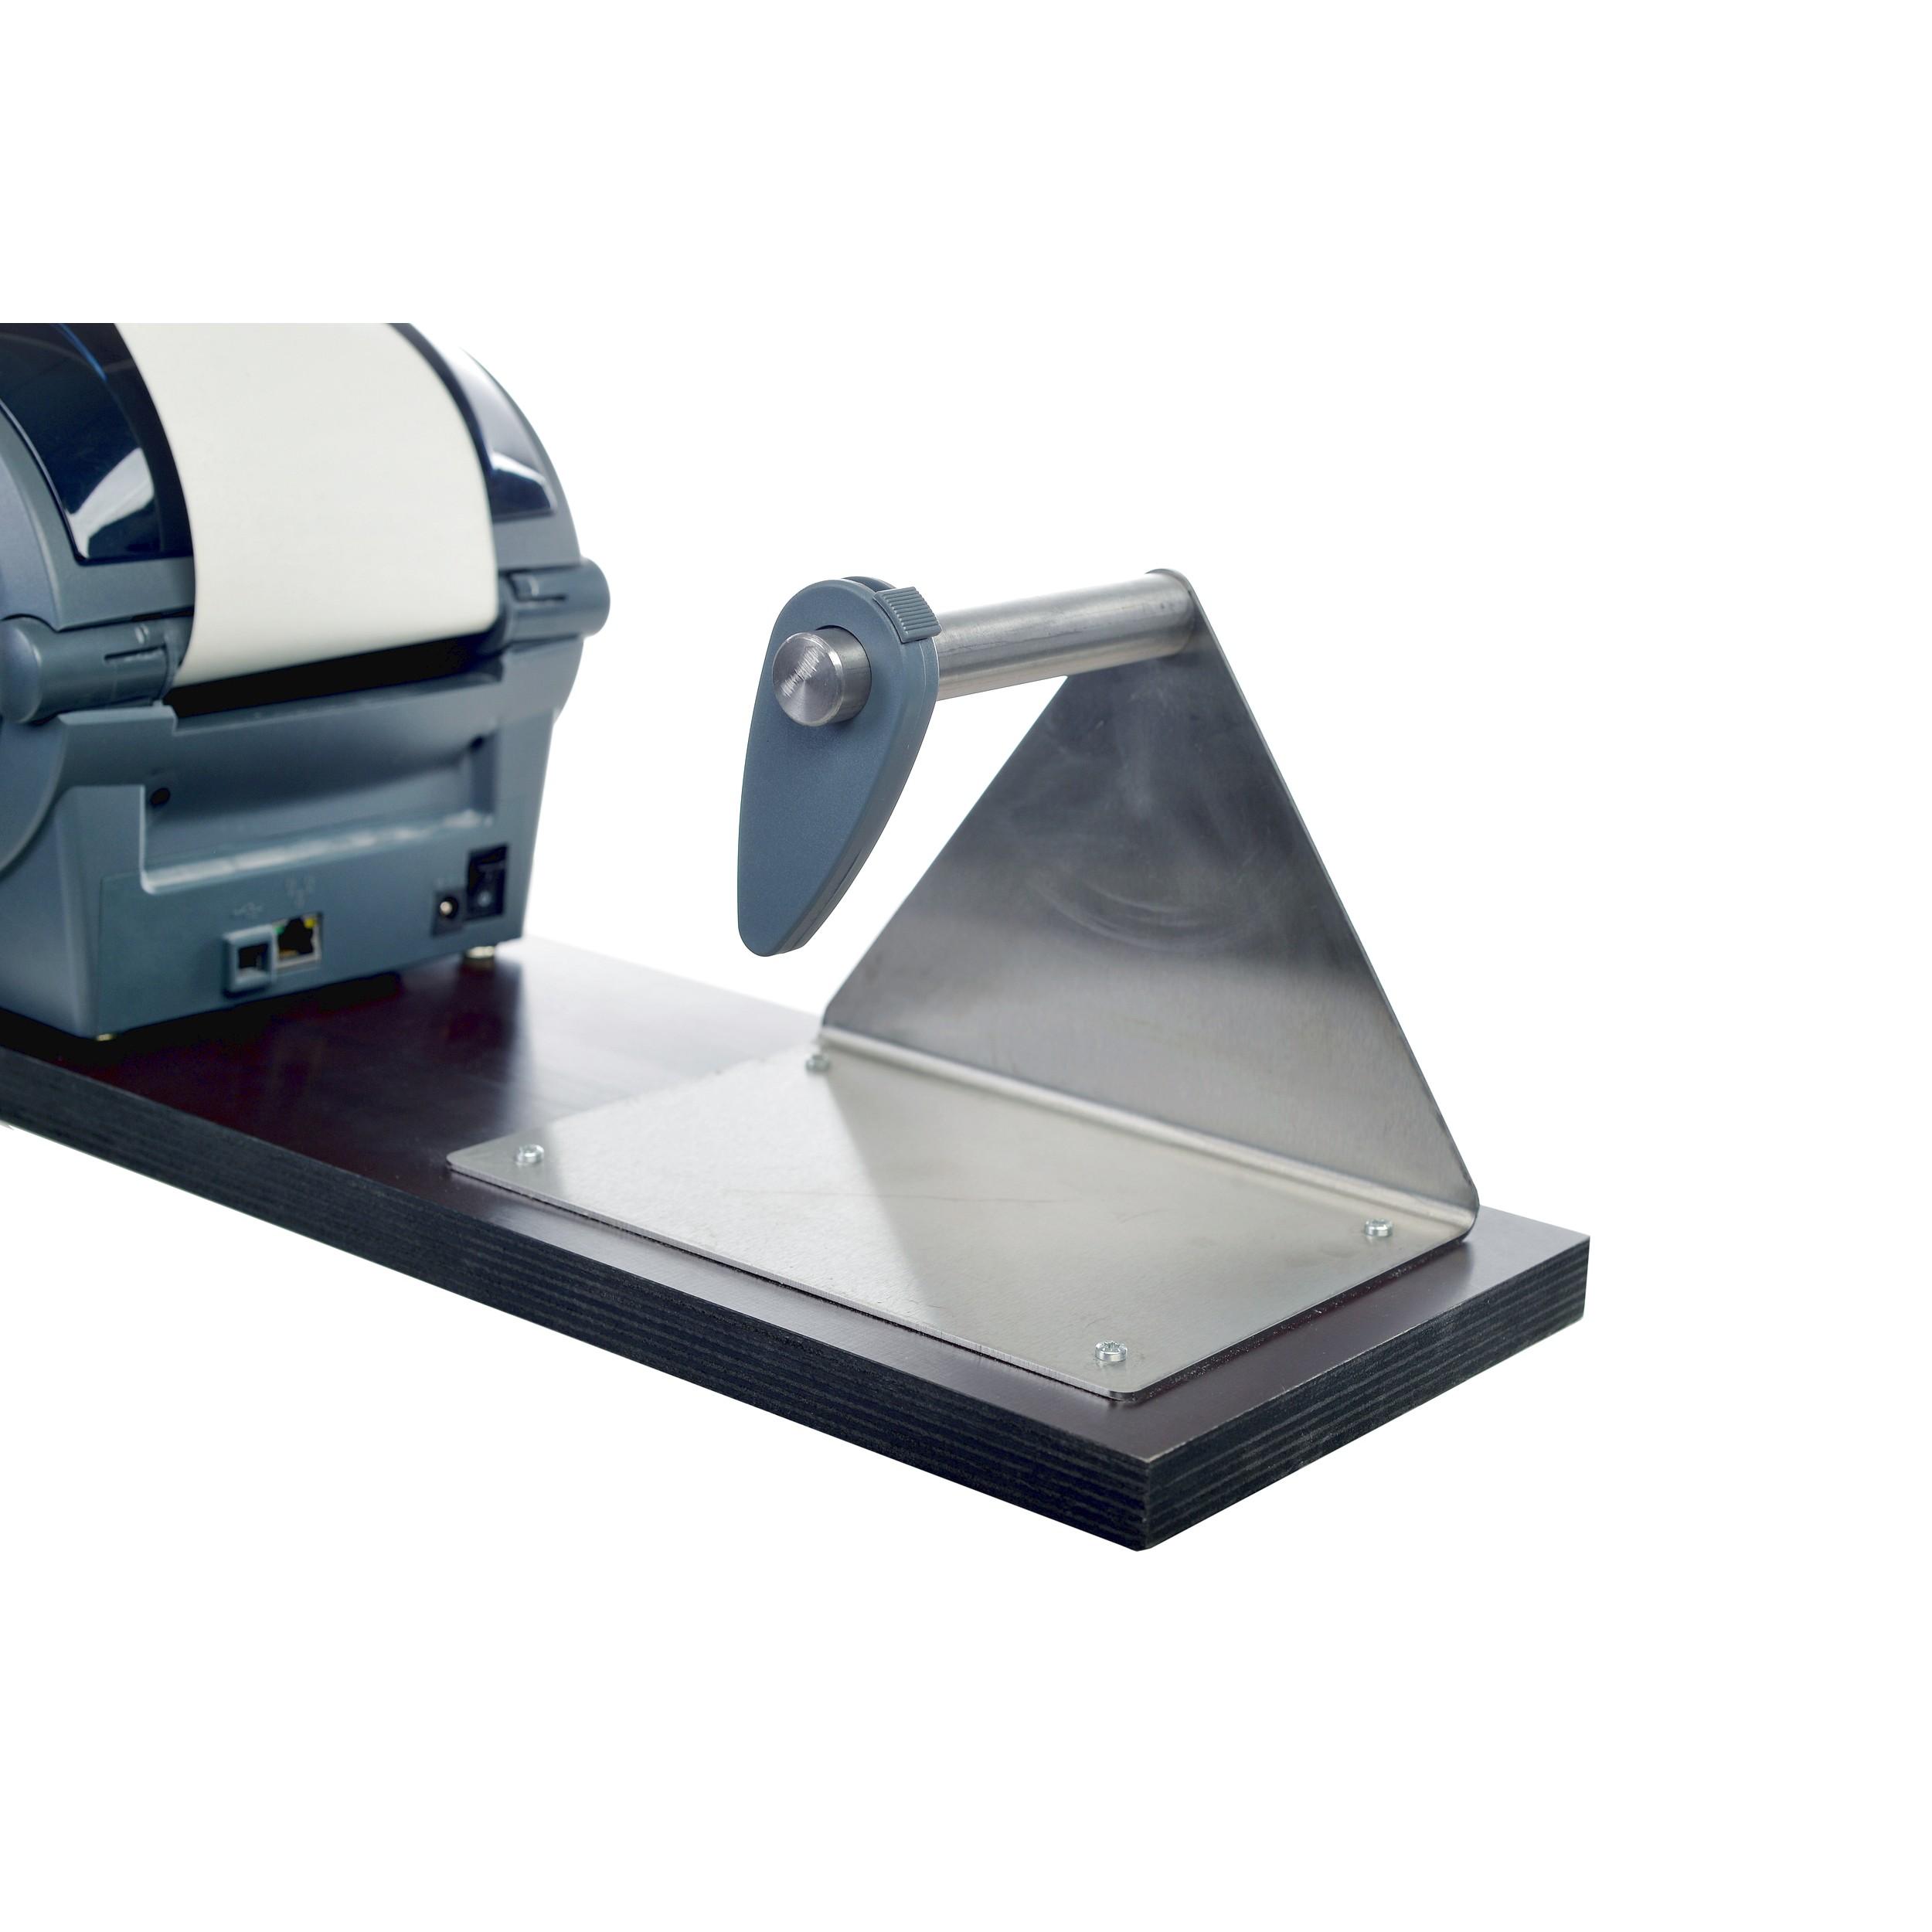 Etikettendrucker Etiketten Drucken Rolle Versandetiketten Rollenhalterung Halterung Versand Logistik Hardware 1